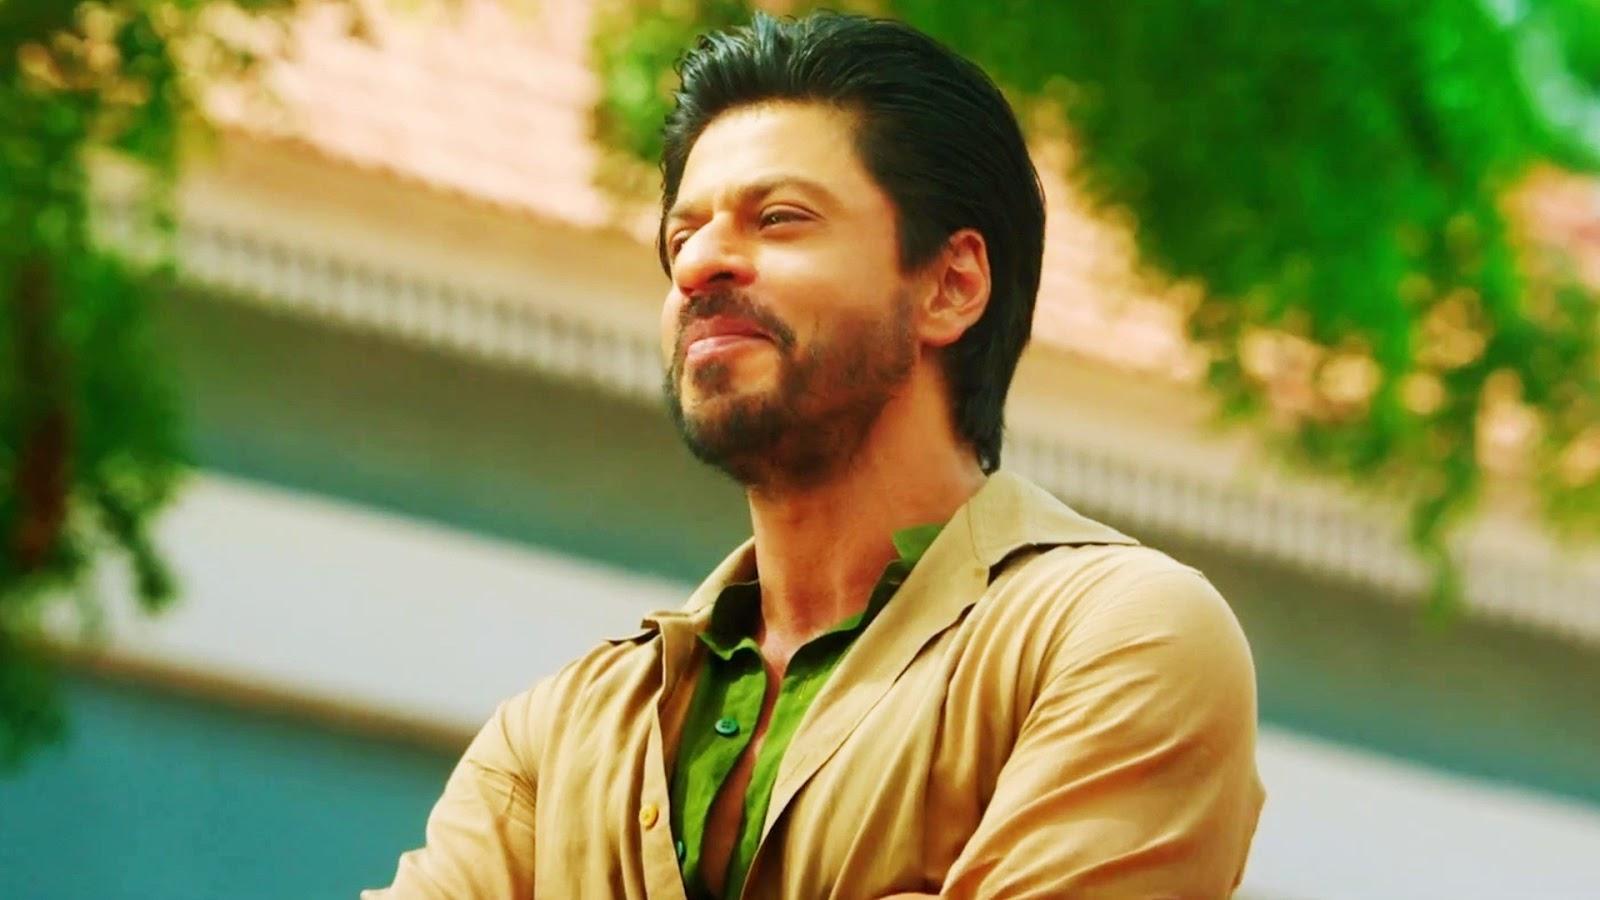 Shahrukh Khan Wallpapers Hd Download Free 1080p: Download HD Wallpapers 1080p Of Young Shahrukh Khan